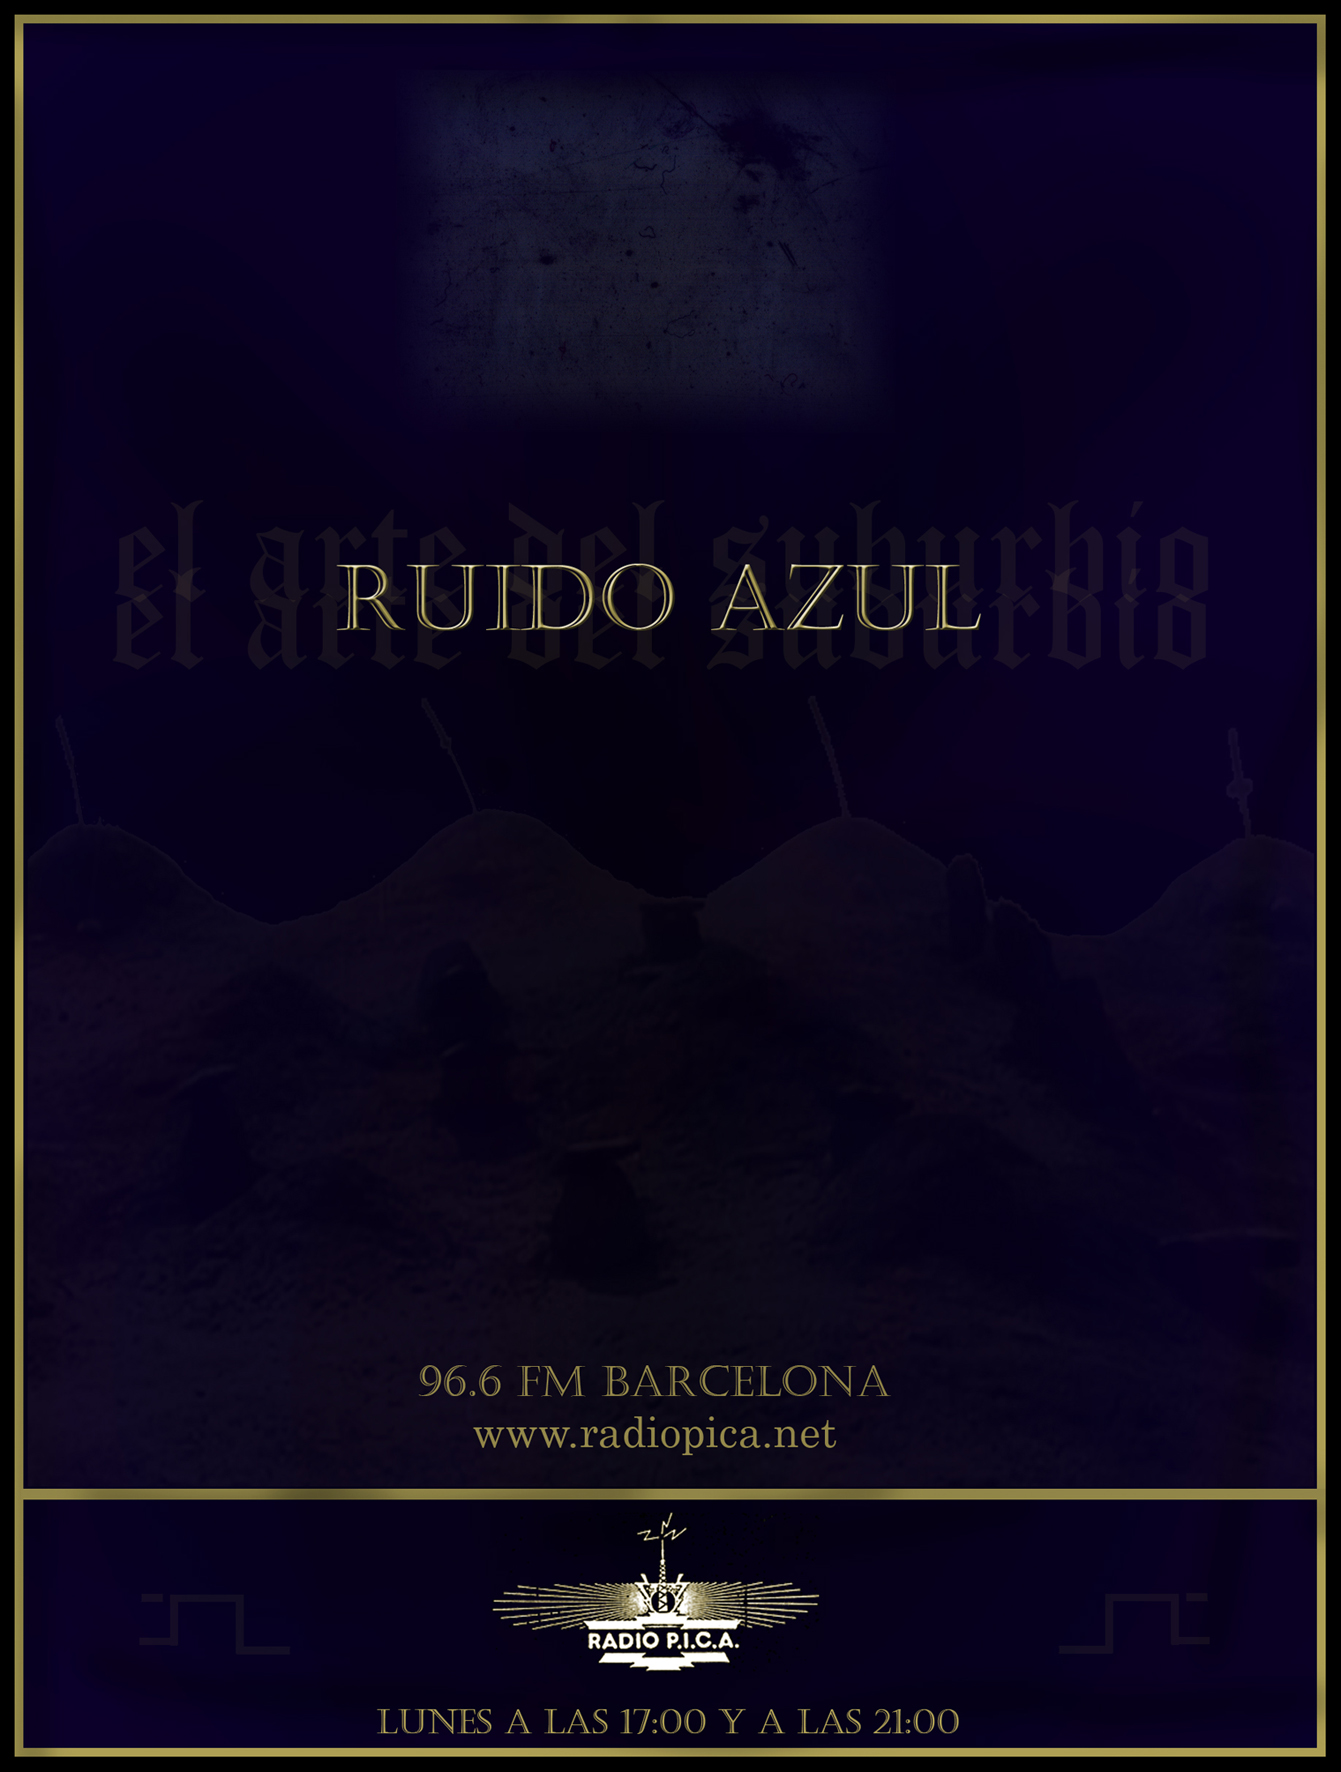 RADIO RUIDO AZUL